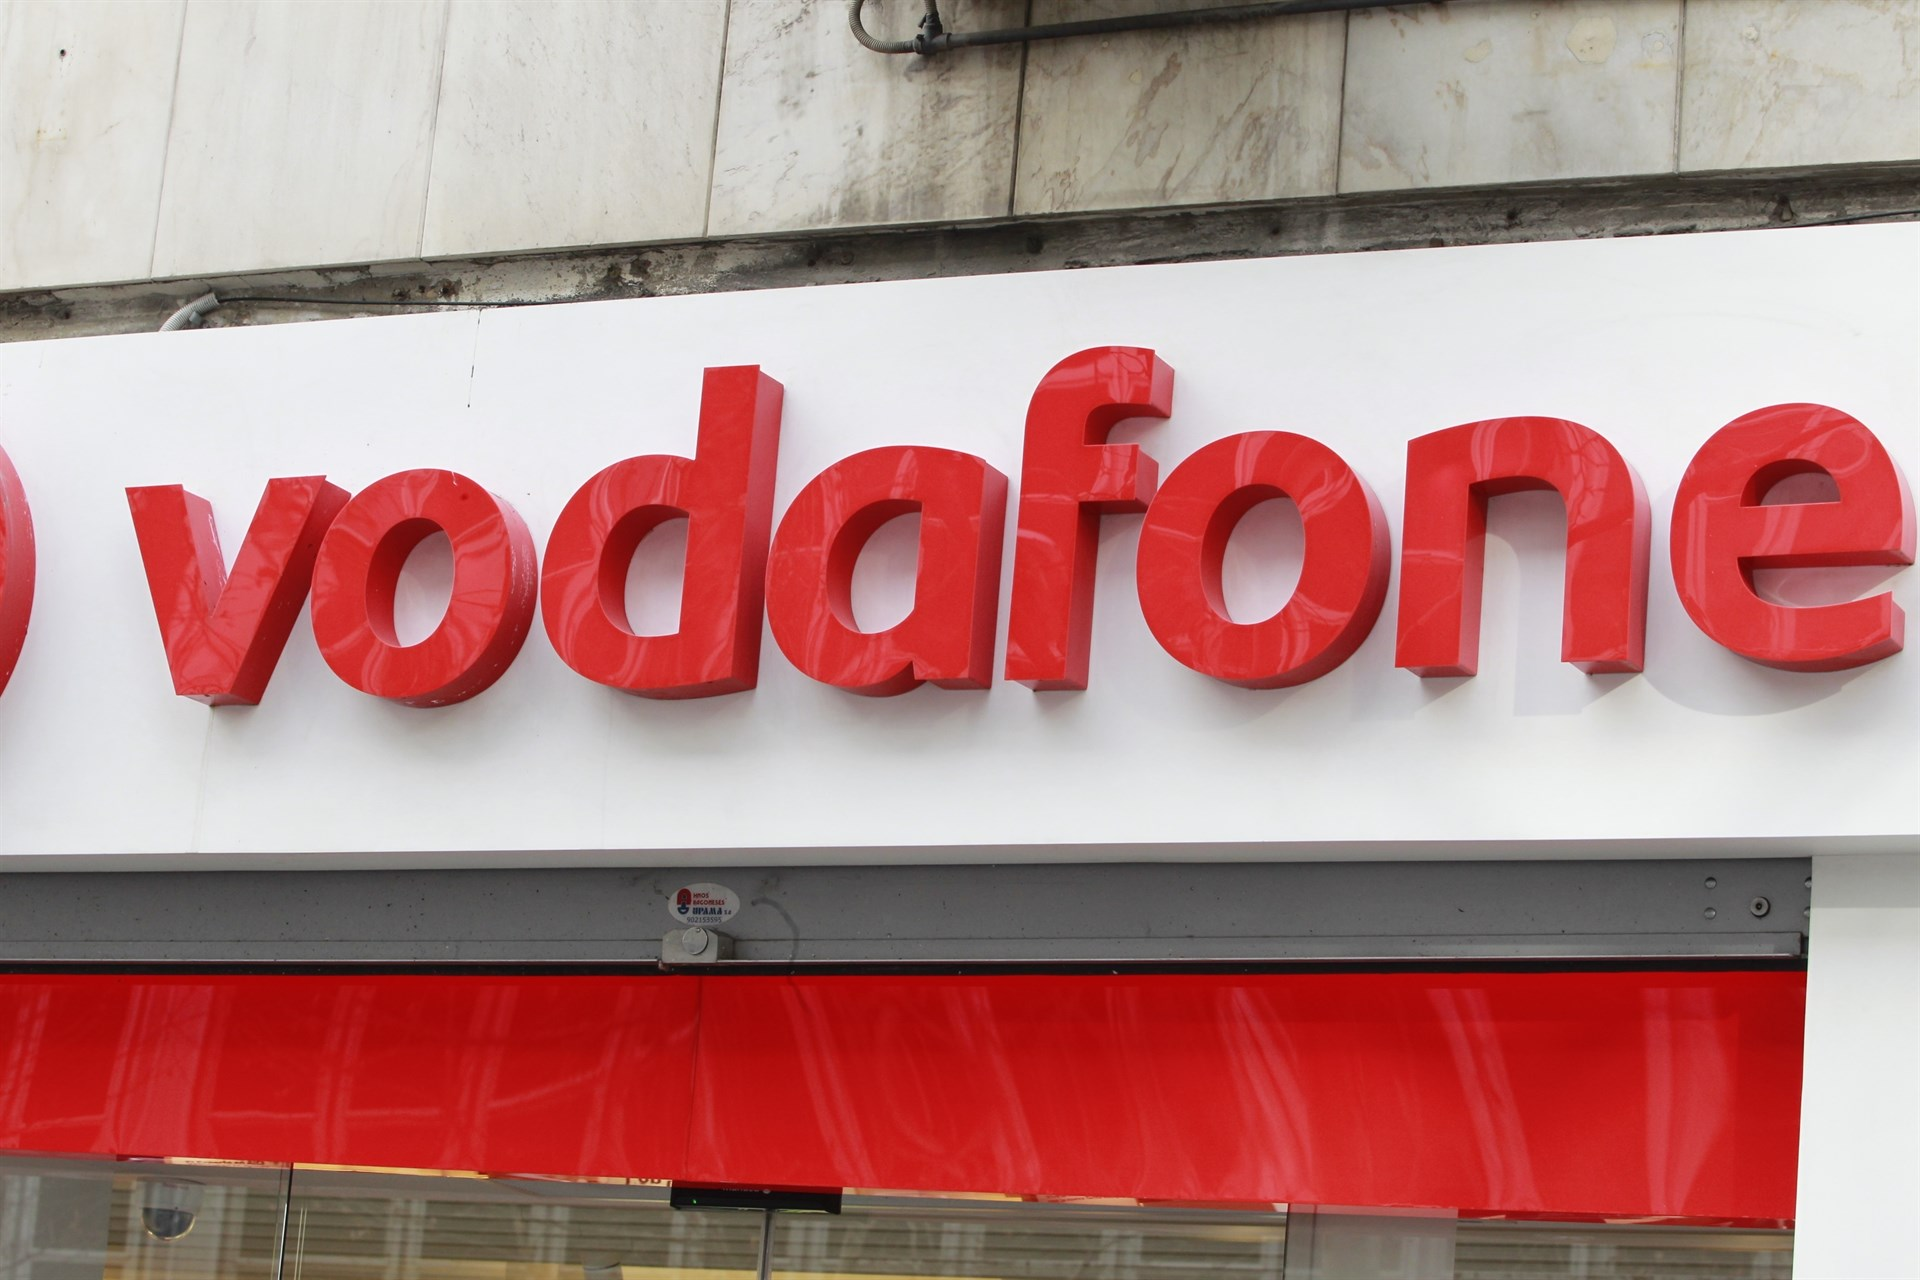 76e84b70b96 Vodafone cobrará 2,5 euros si se llama para pedir el PIN del móvil ...